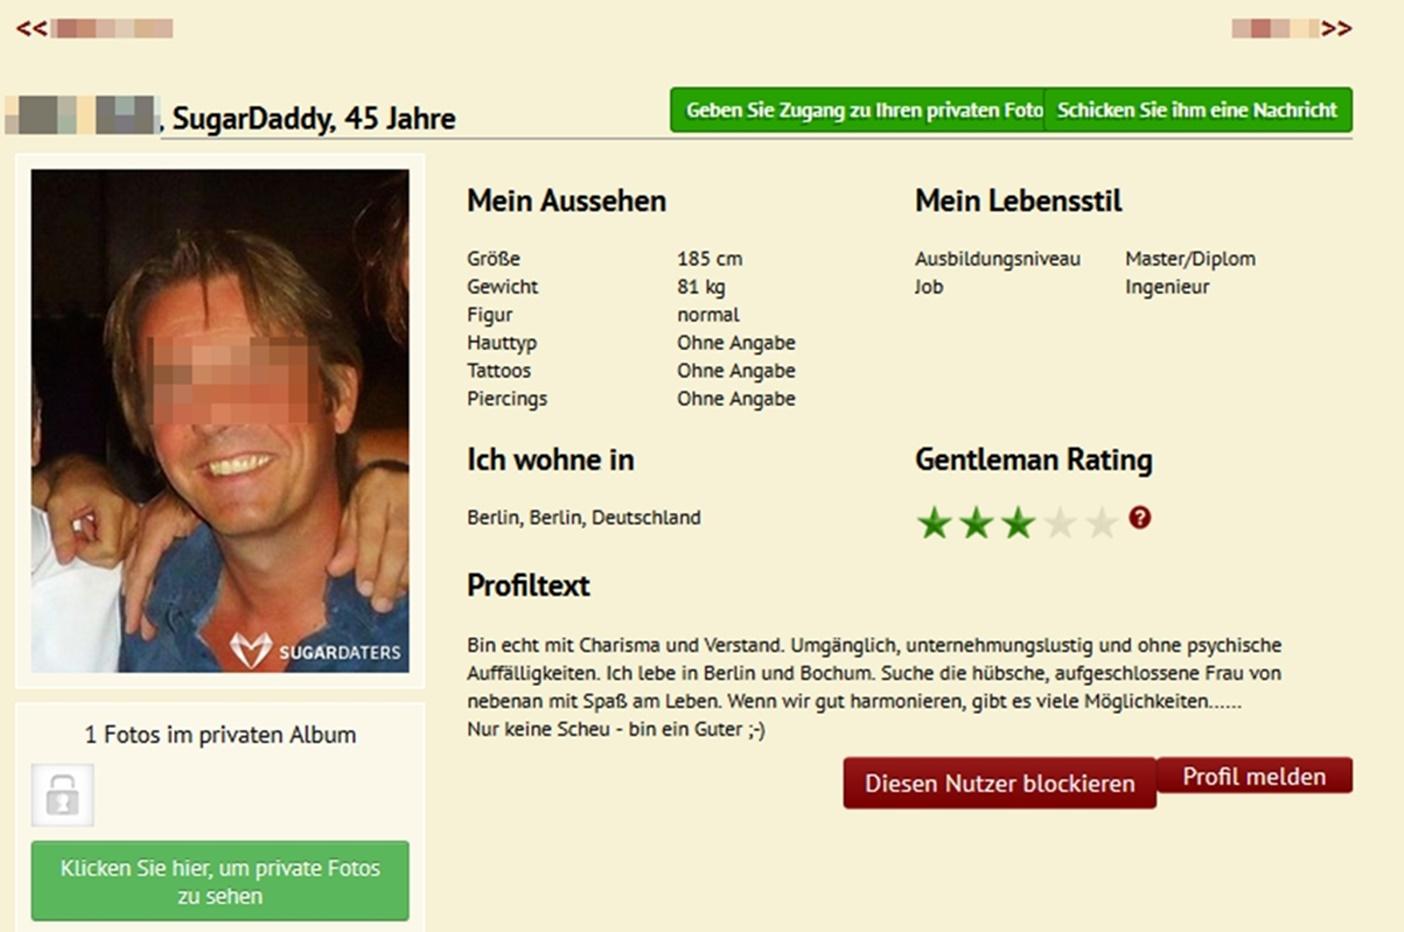 Sugardaddy Profil